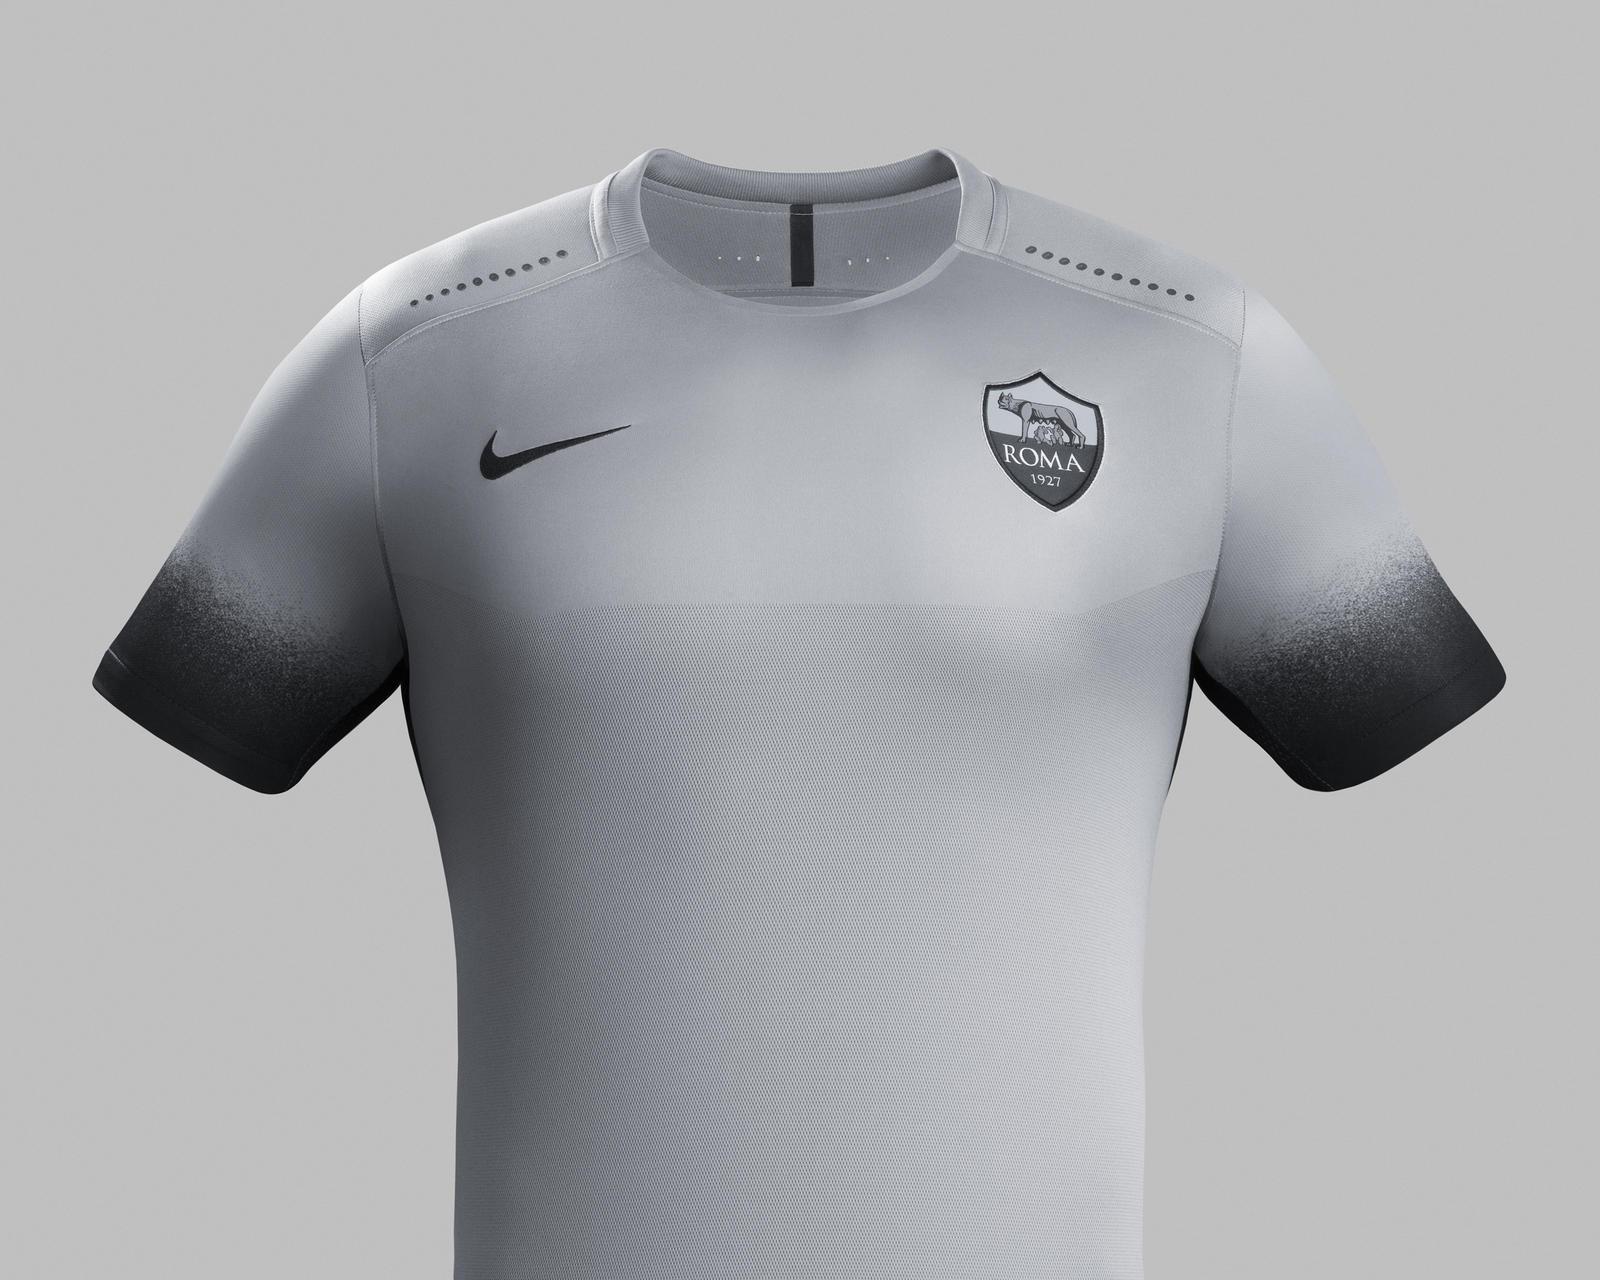 Ho15 Club Kits Jersey Pr Front As Roma R Original